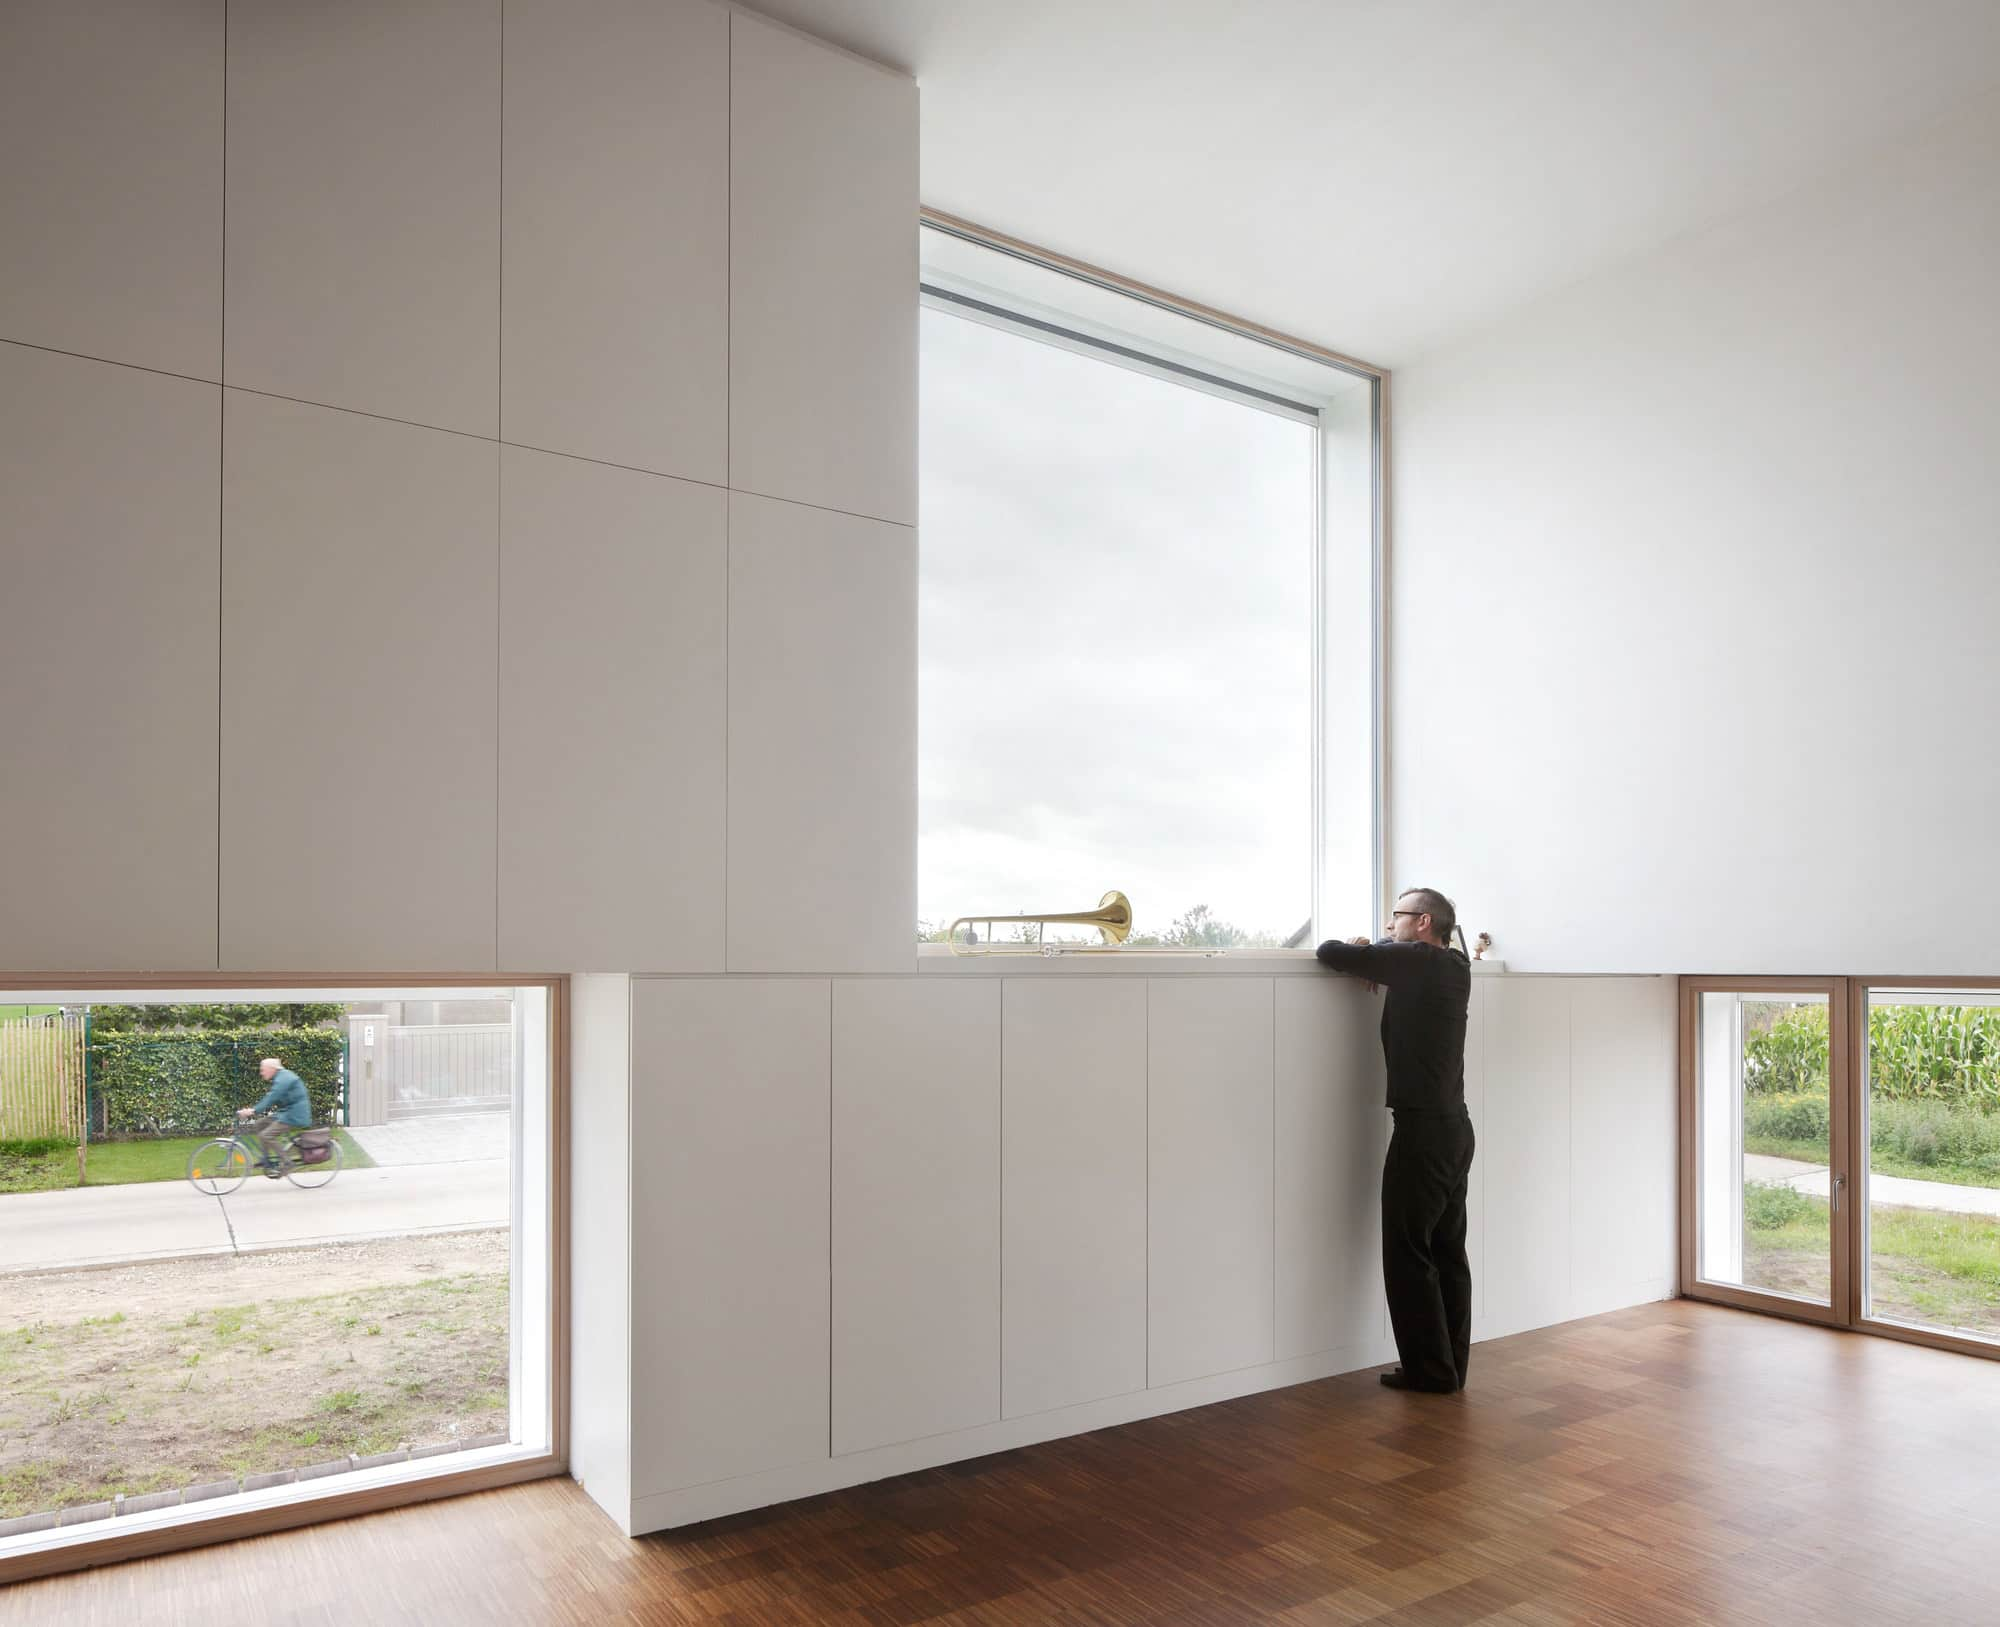 zero-energy-house-blaf-architecten5